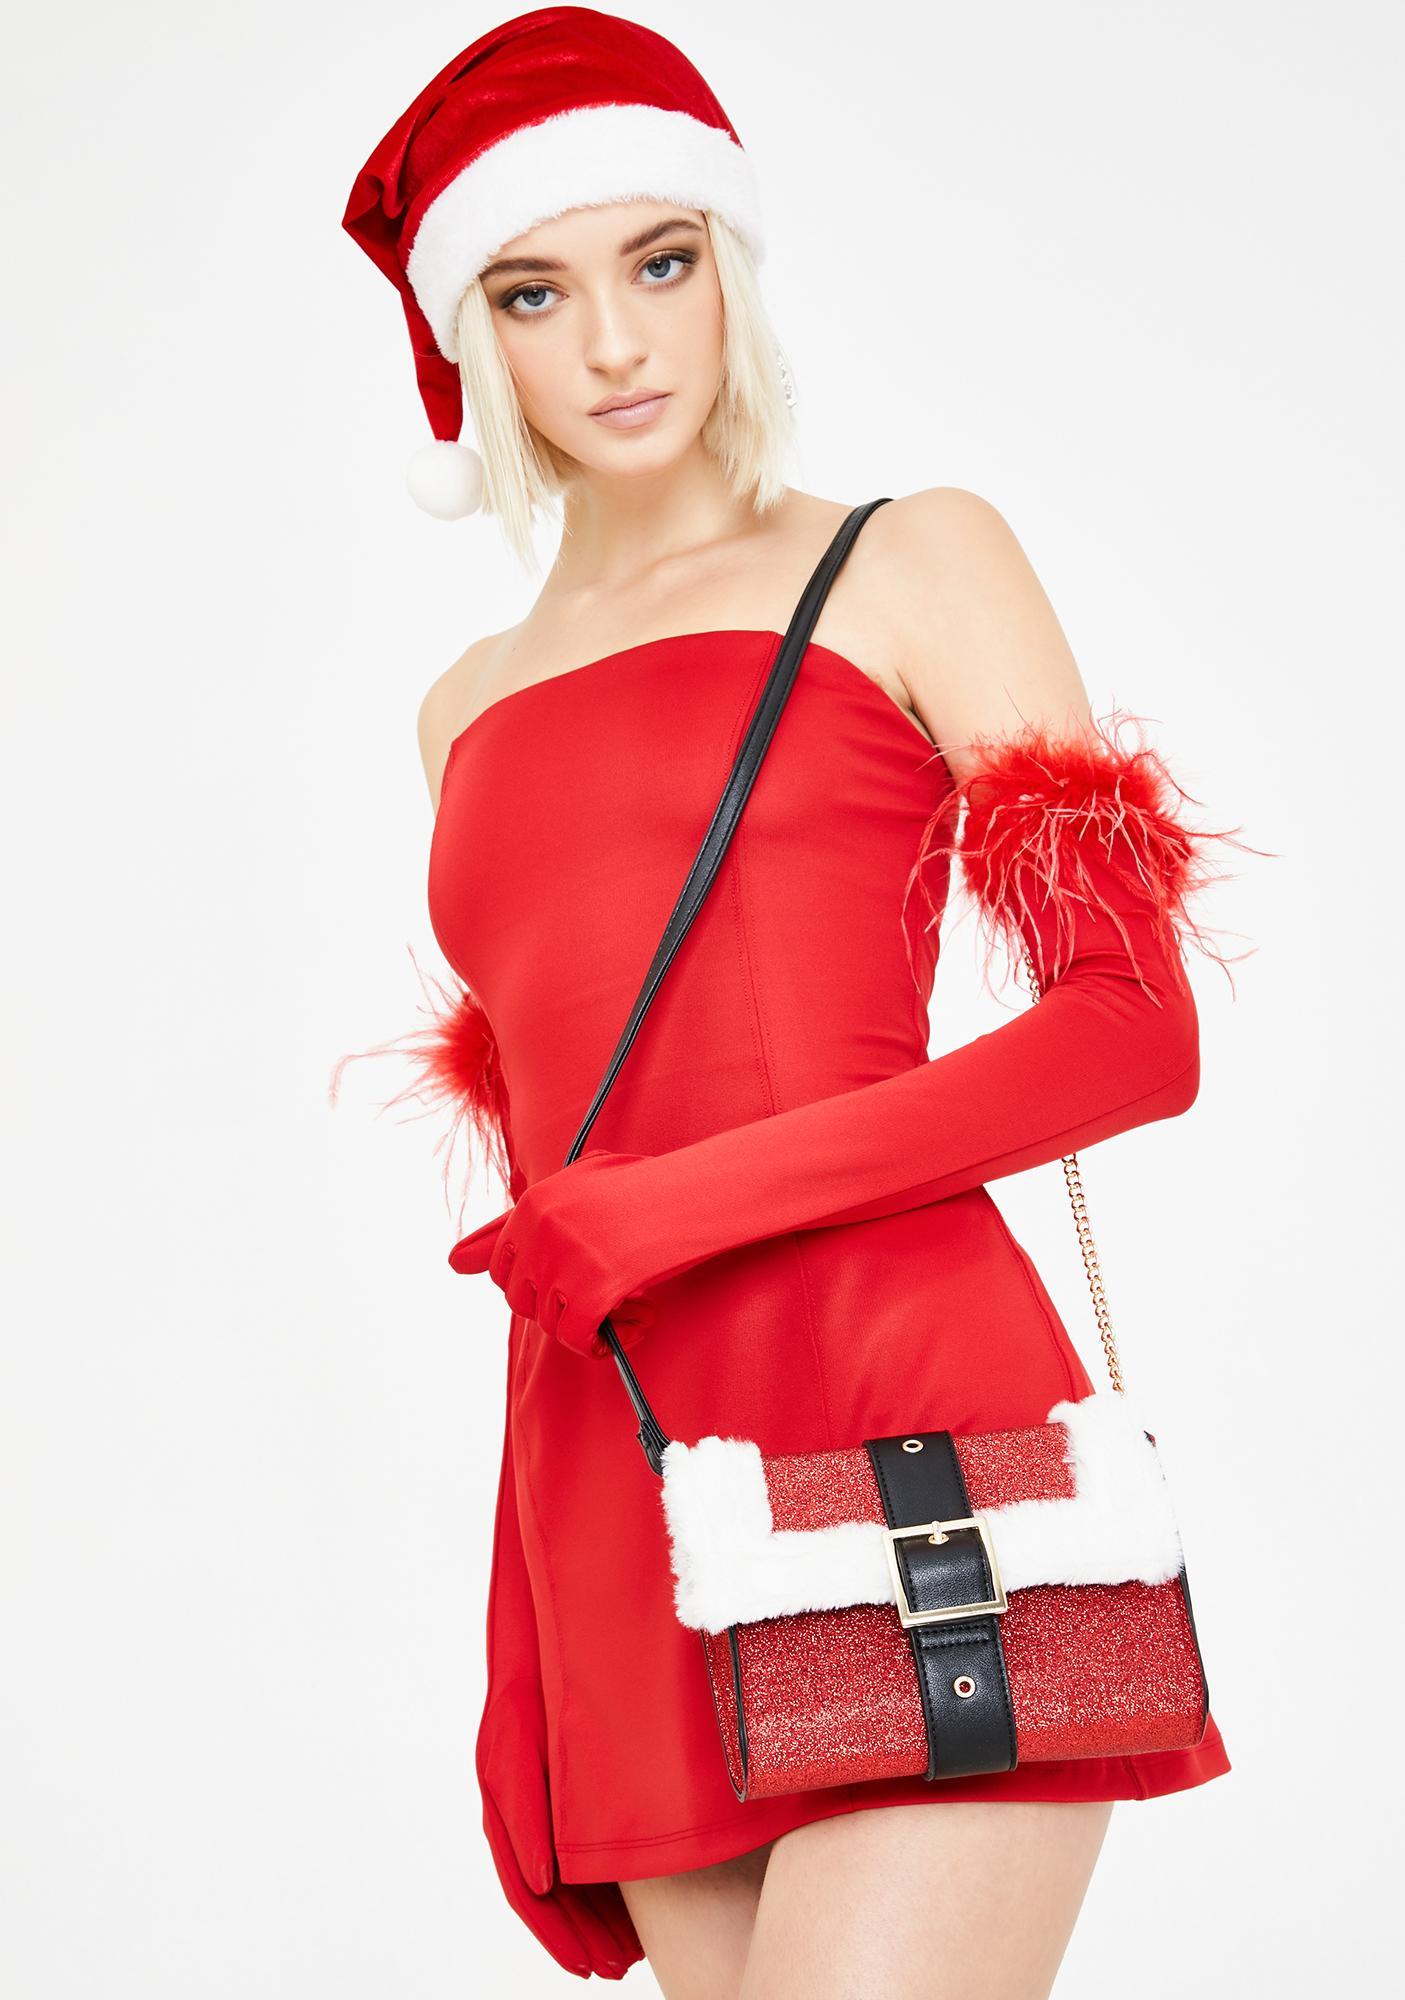 sass-for-santa-crossbody-bag by dolls-kill